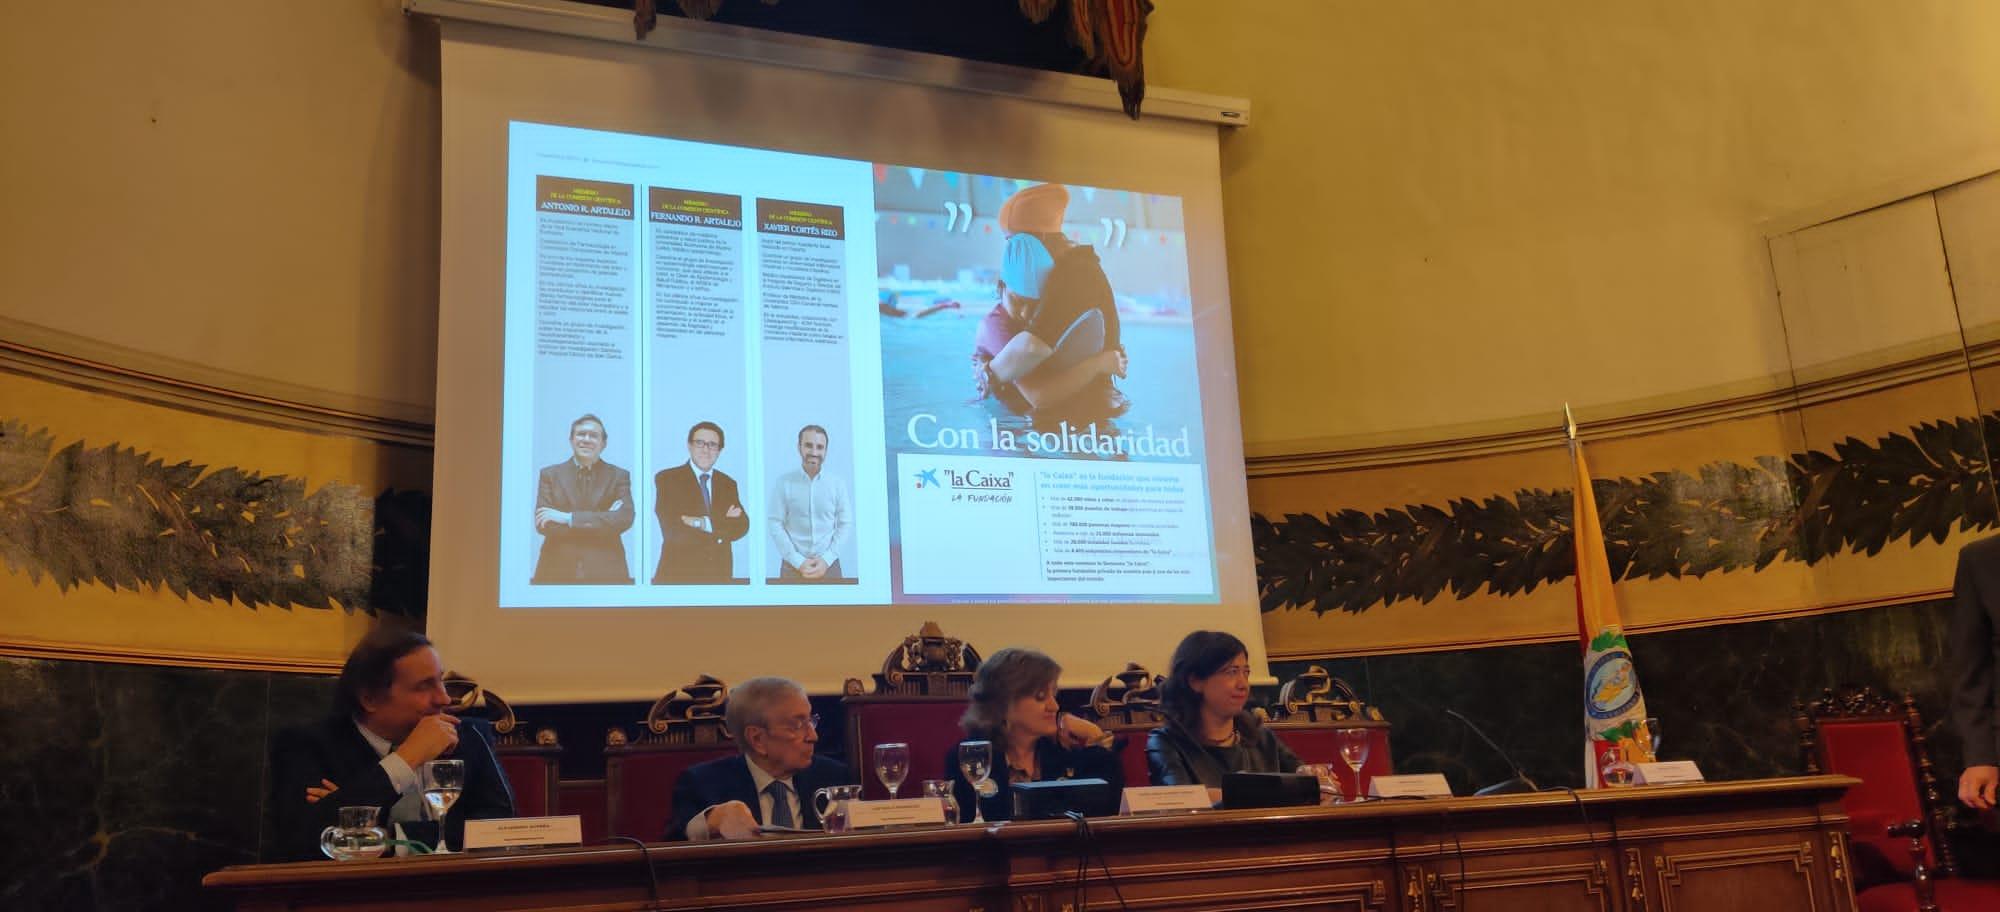 Revista médica científica del Levante-EMV